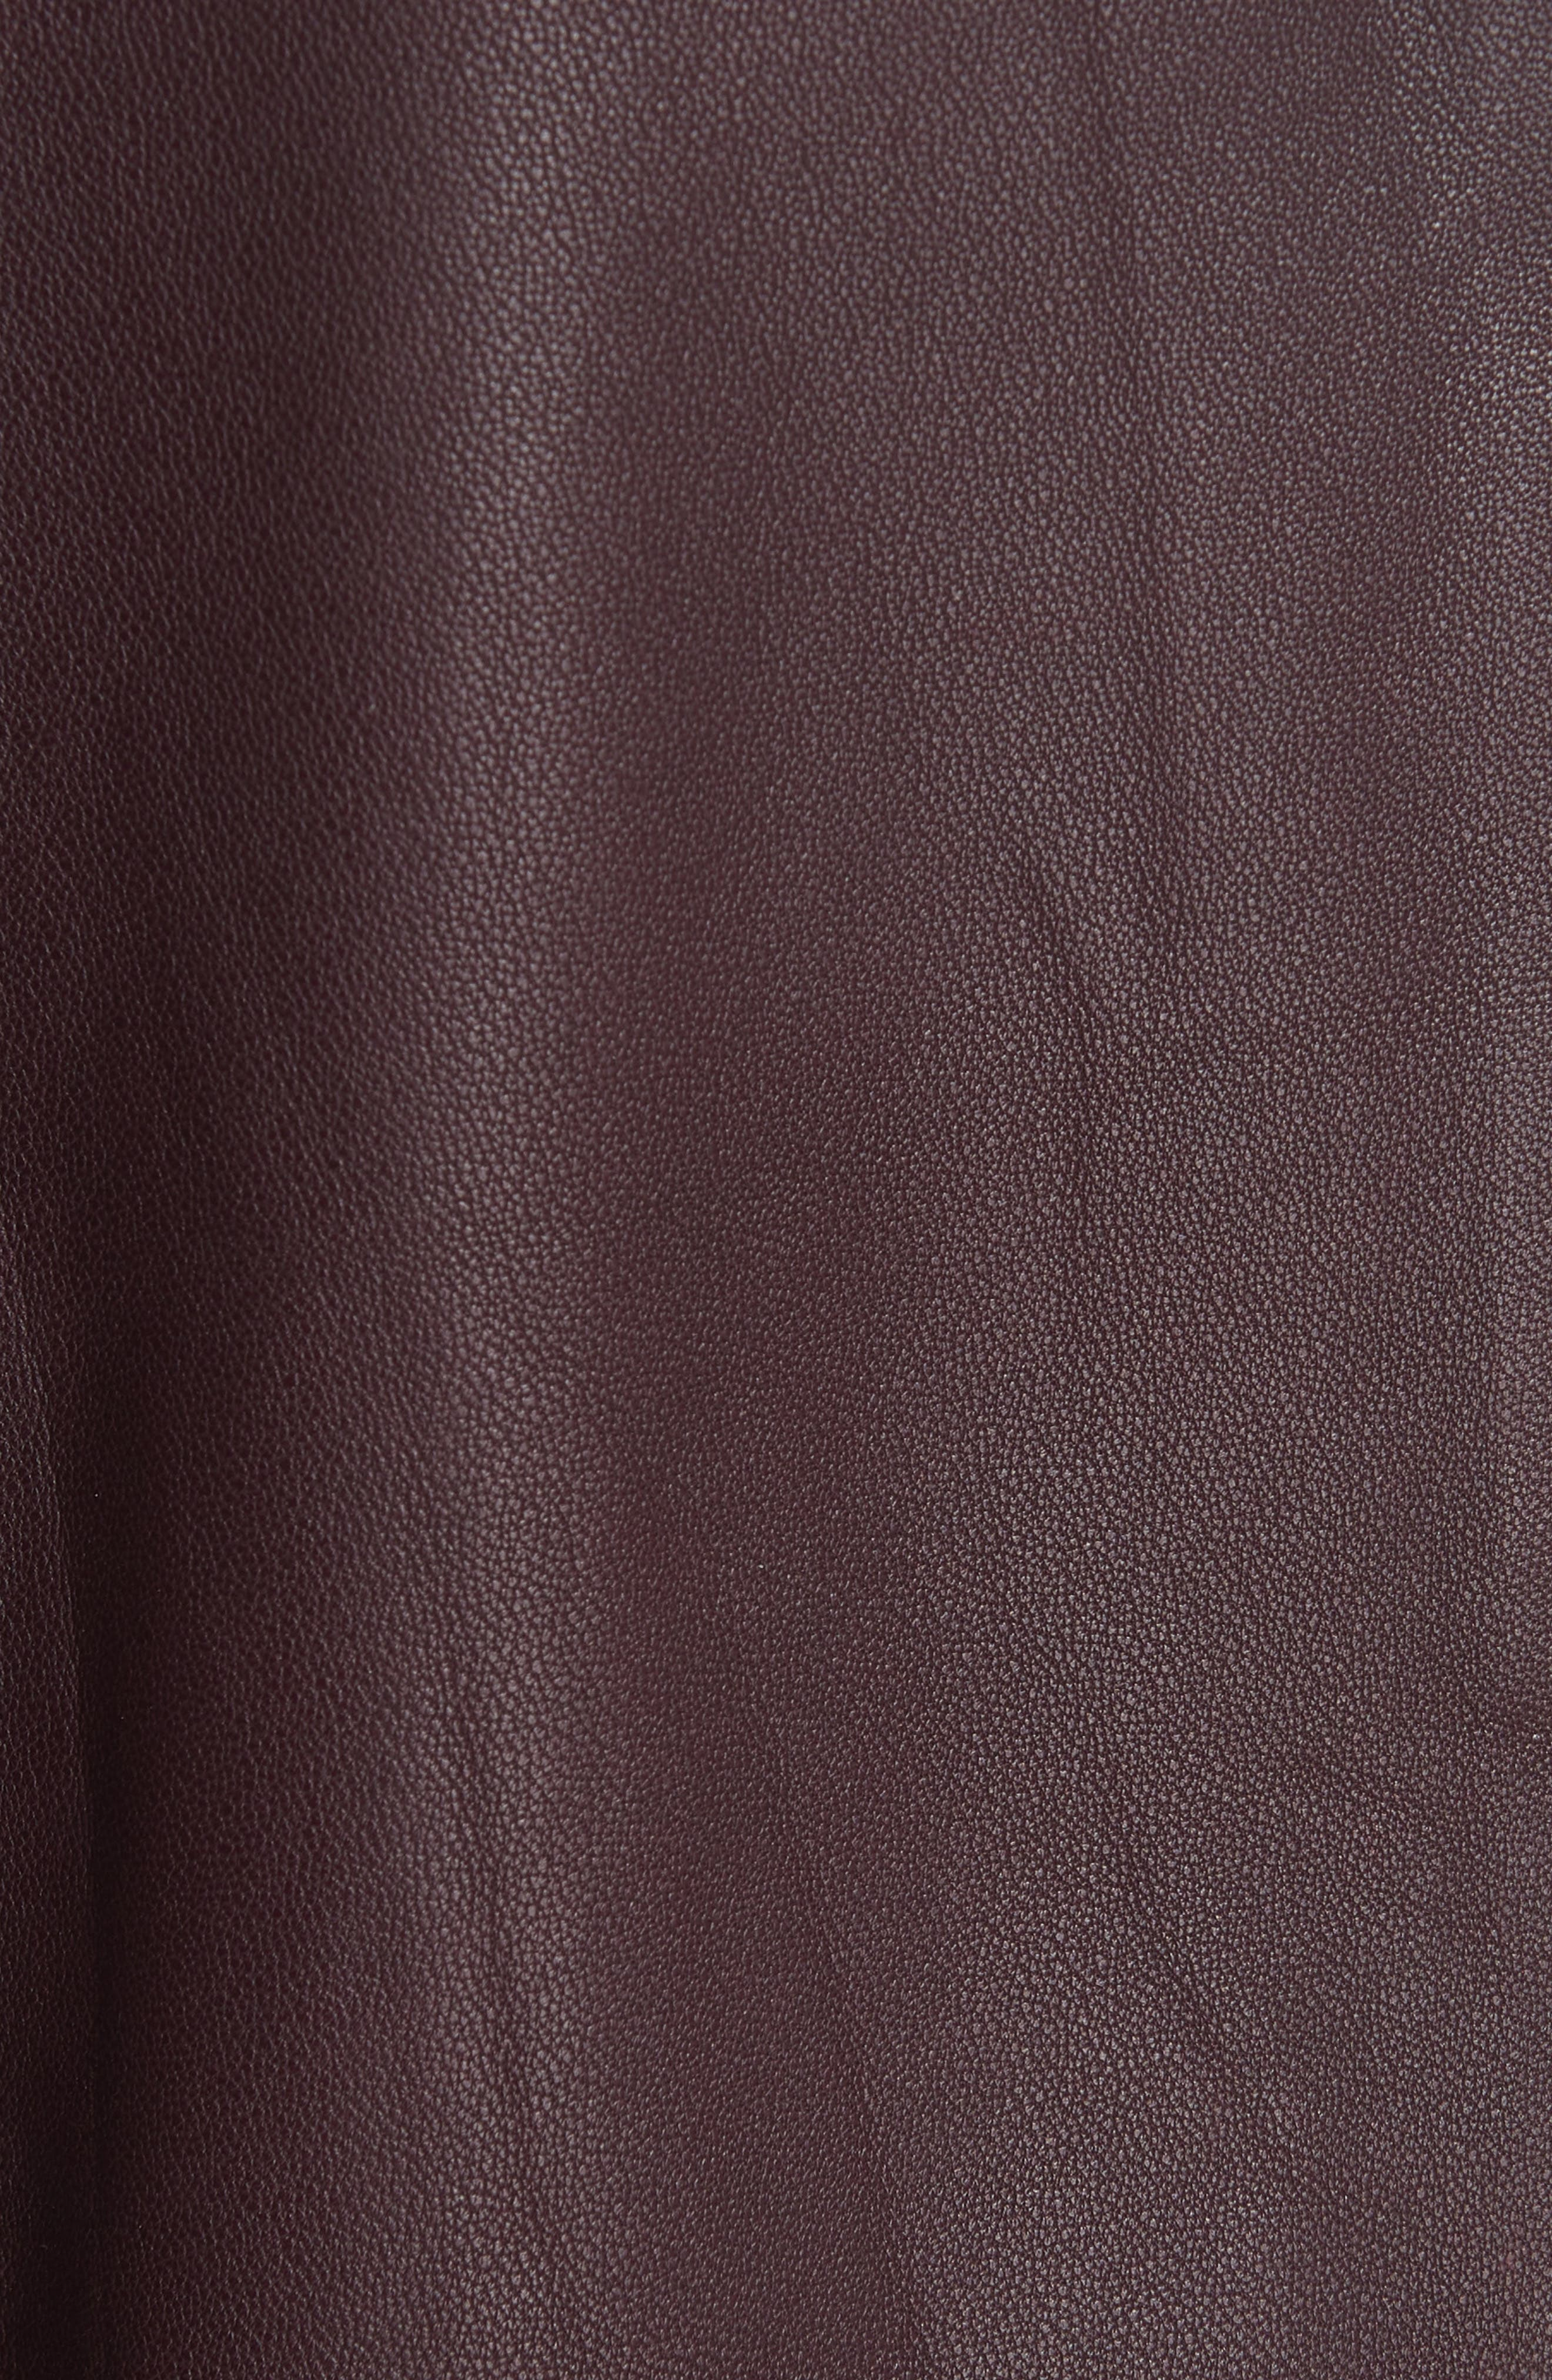 Zip Cross Front Leather Jacket,                             Alternate thumbnail 4, color,                             Black Cherry